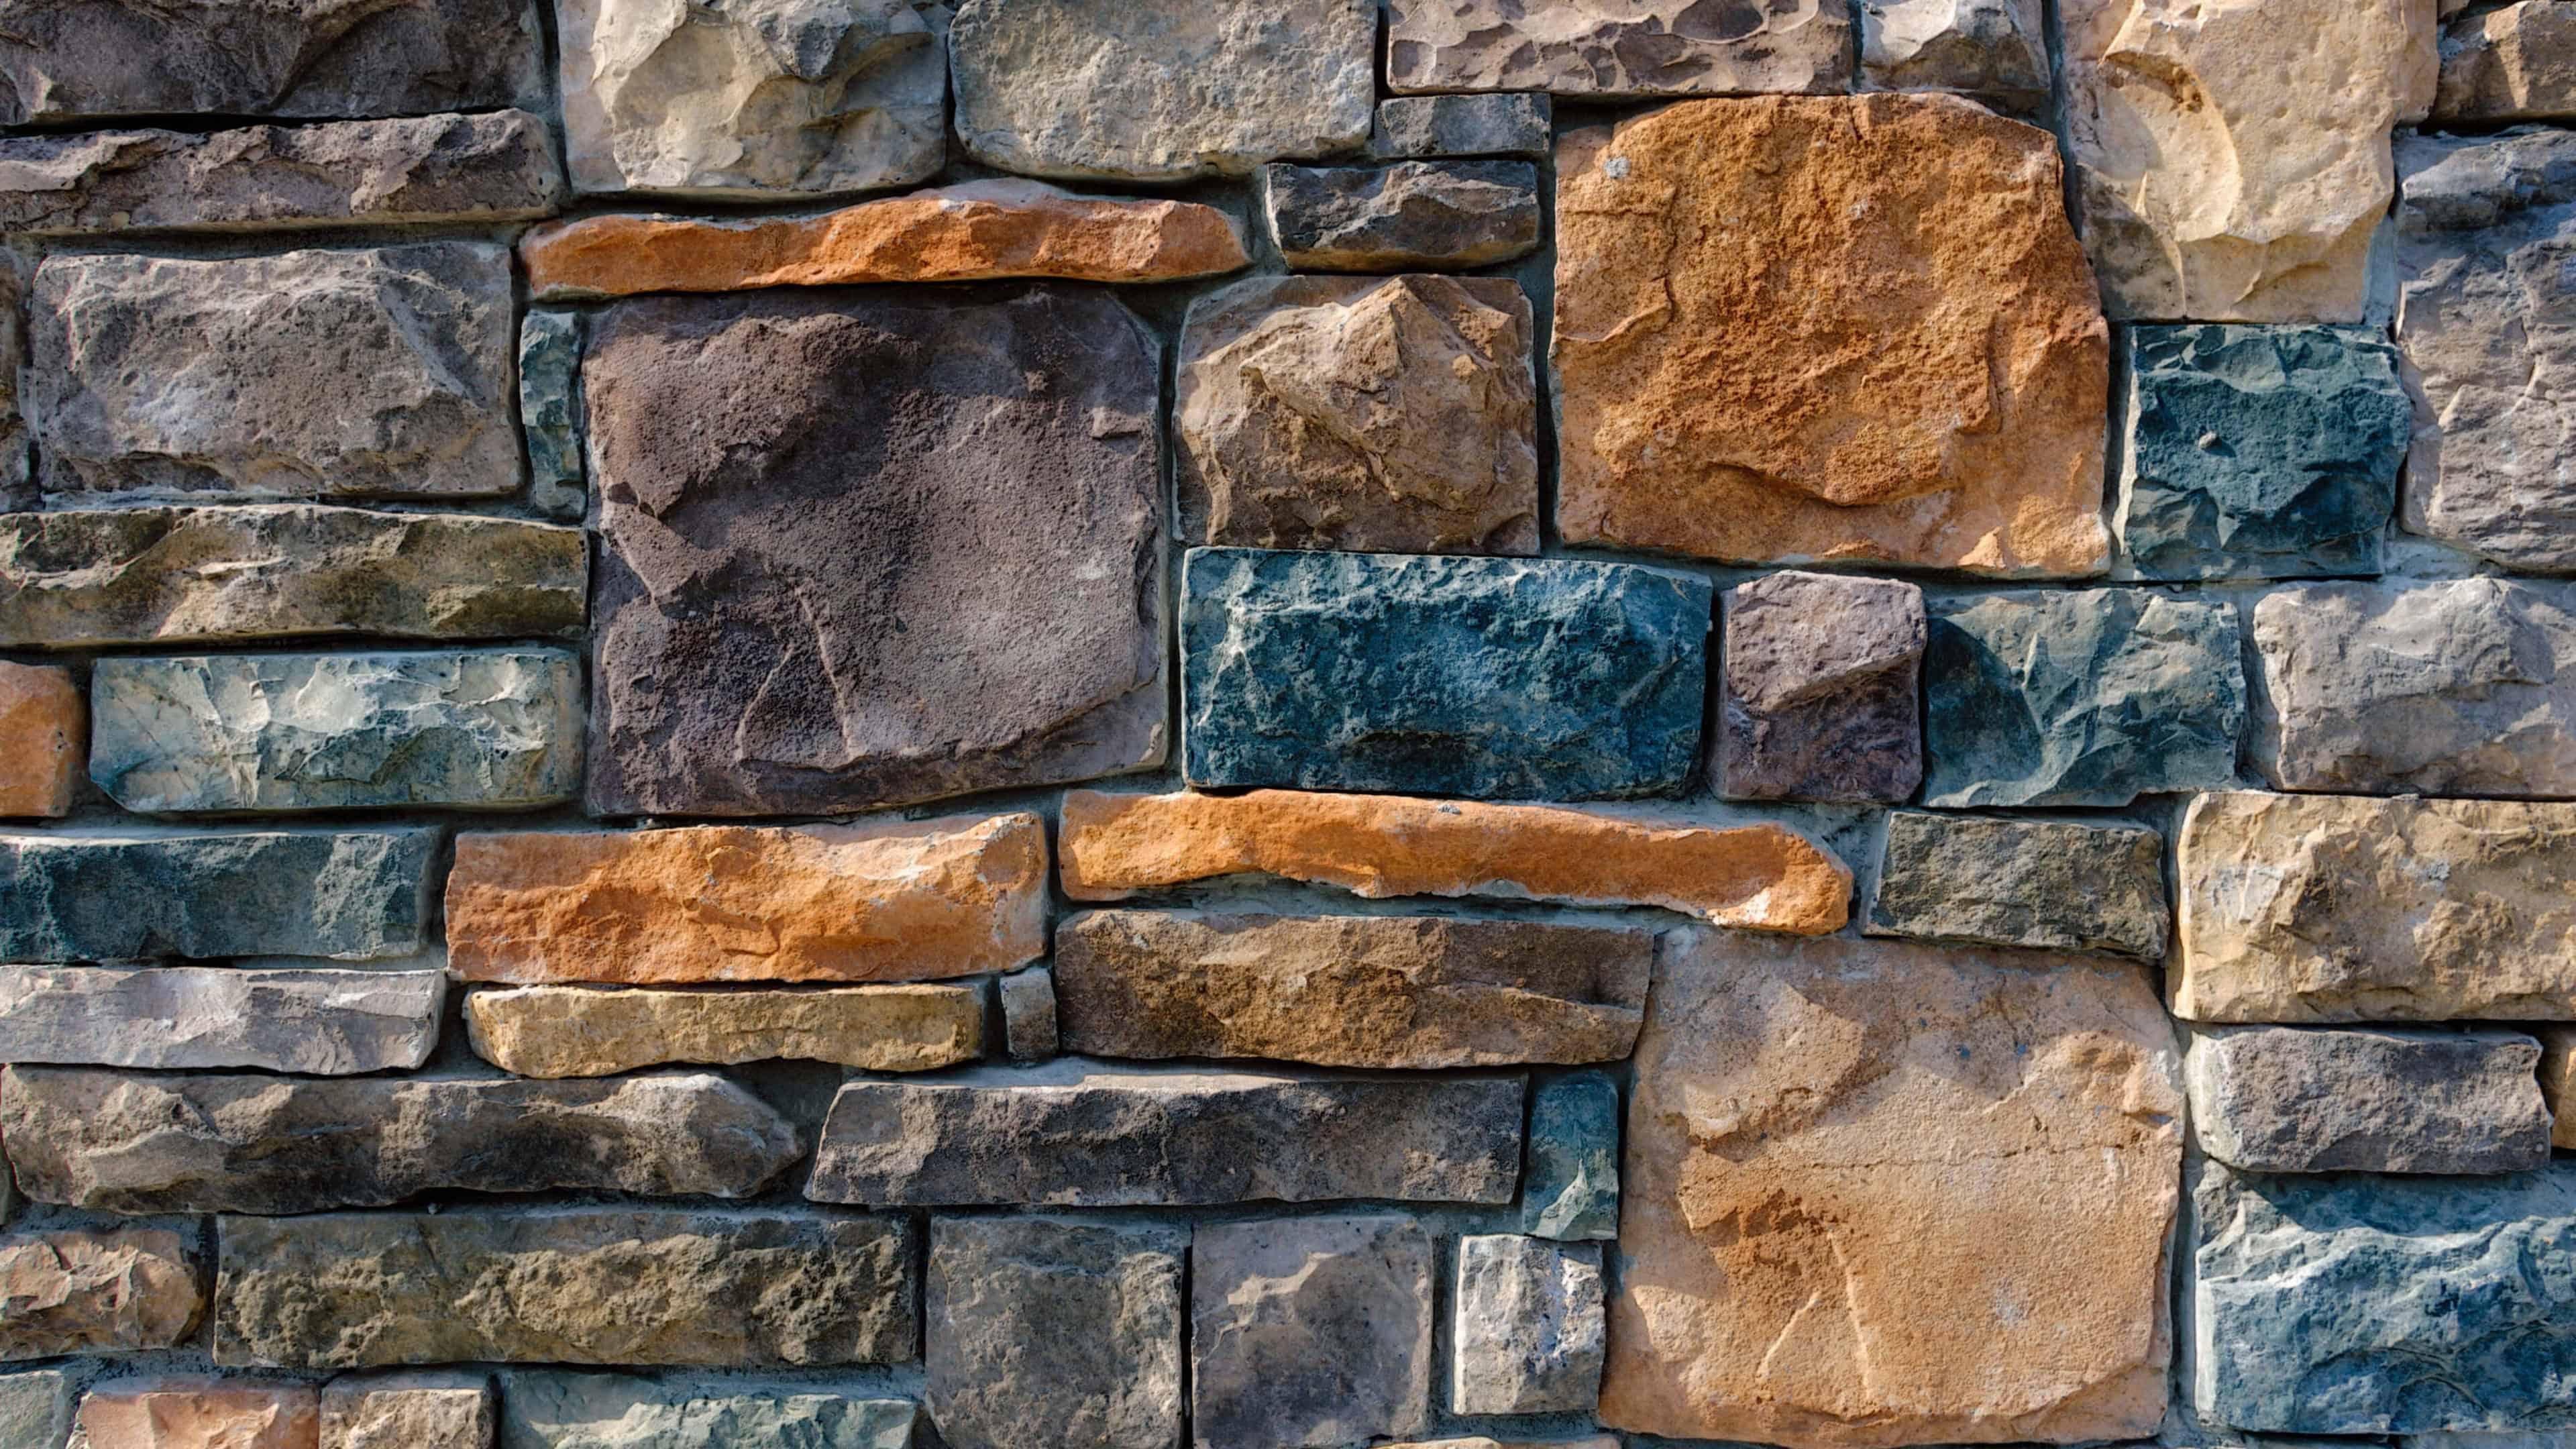 stone wall uhd 4k wallpaper